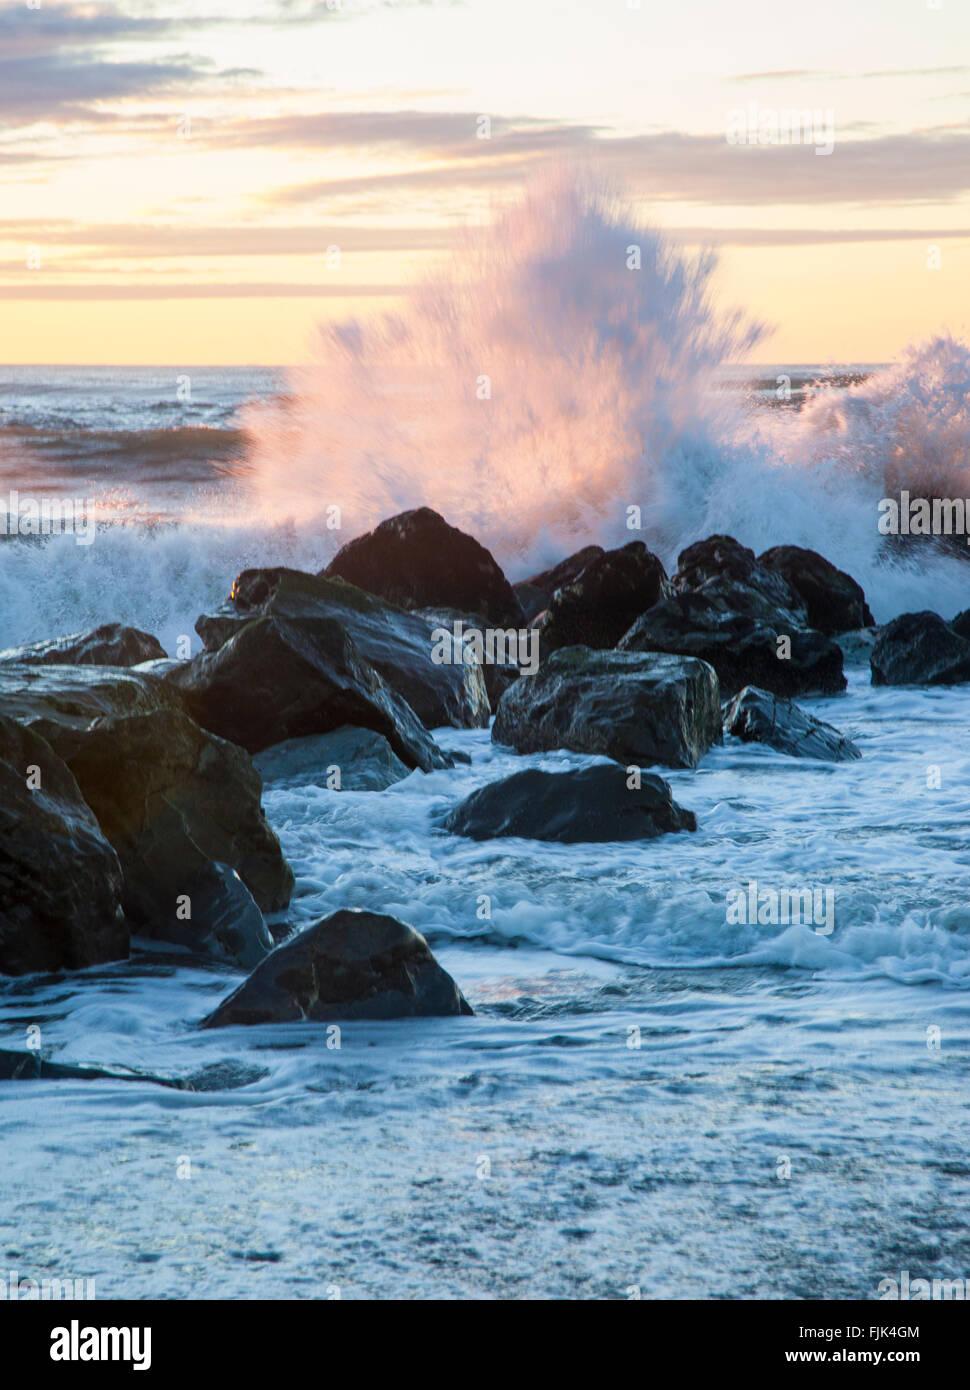 Waves from the Tasman Sea crashing on rocks at sunset, Hokitika, South Island, New Zealand - Stock Image